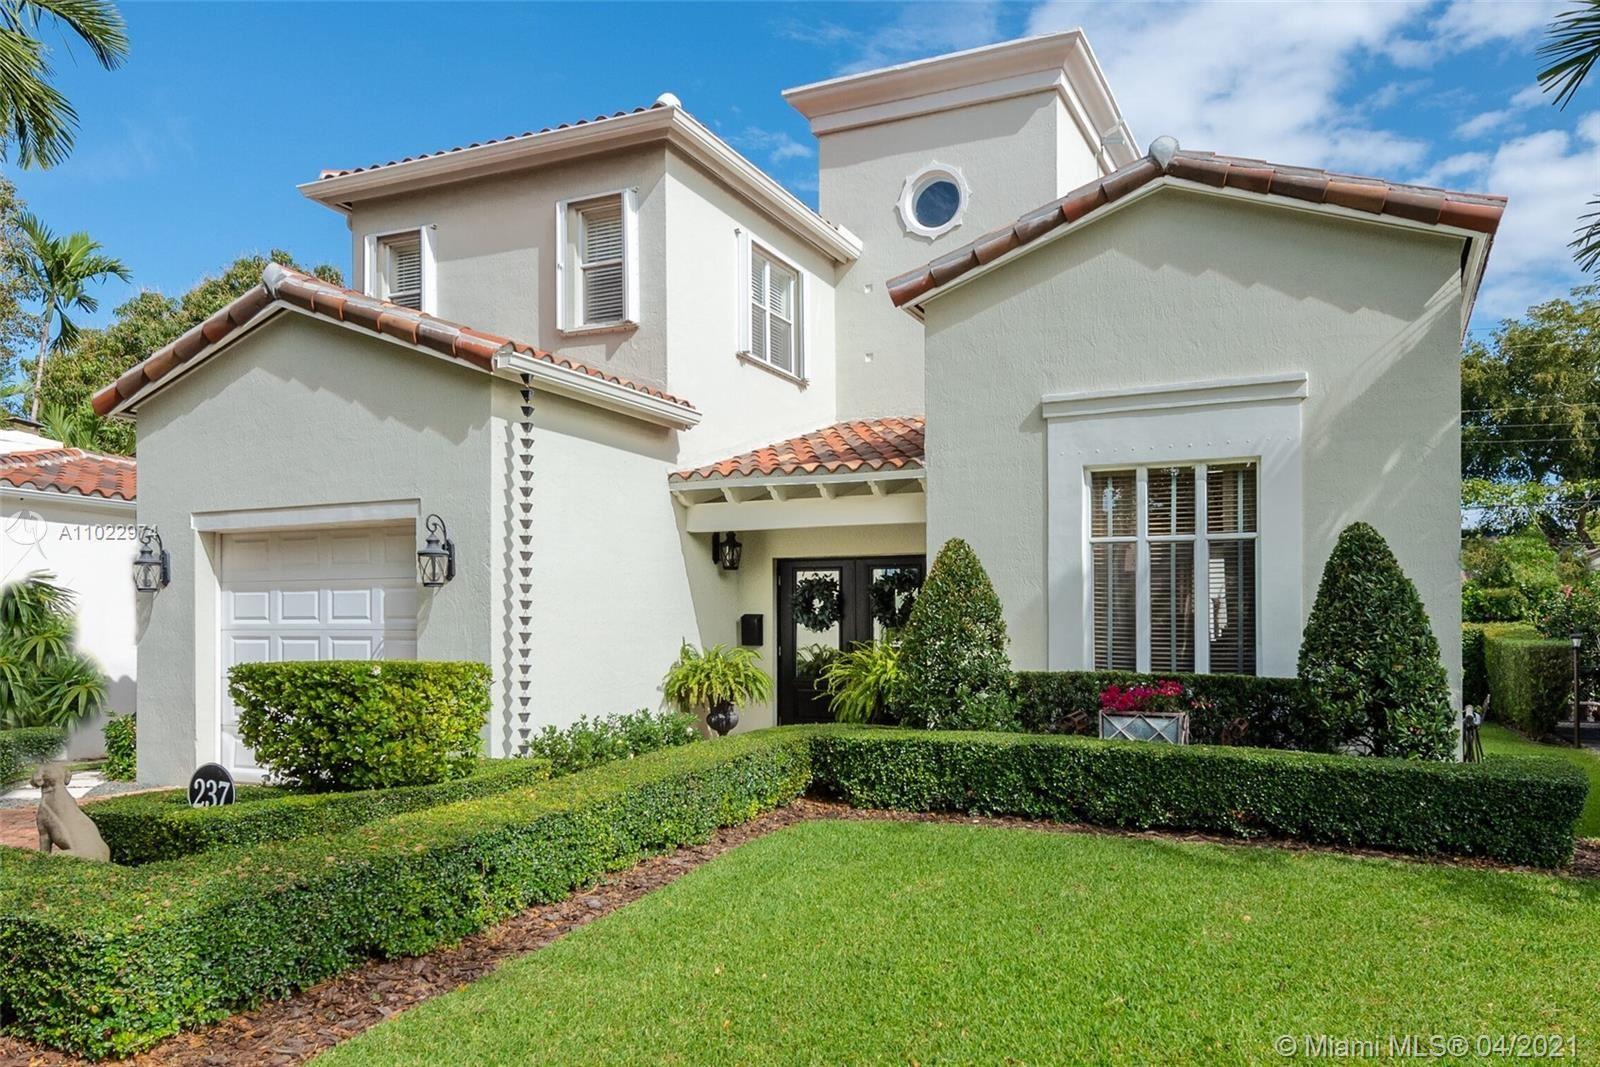 237 Camilo Ave, Coral Gables, FL 33134 - #: A11022974